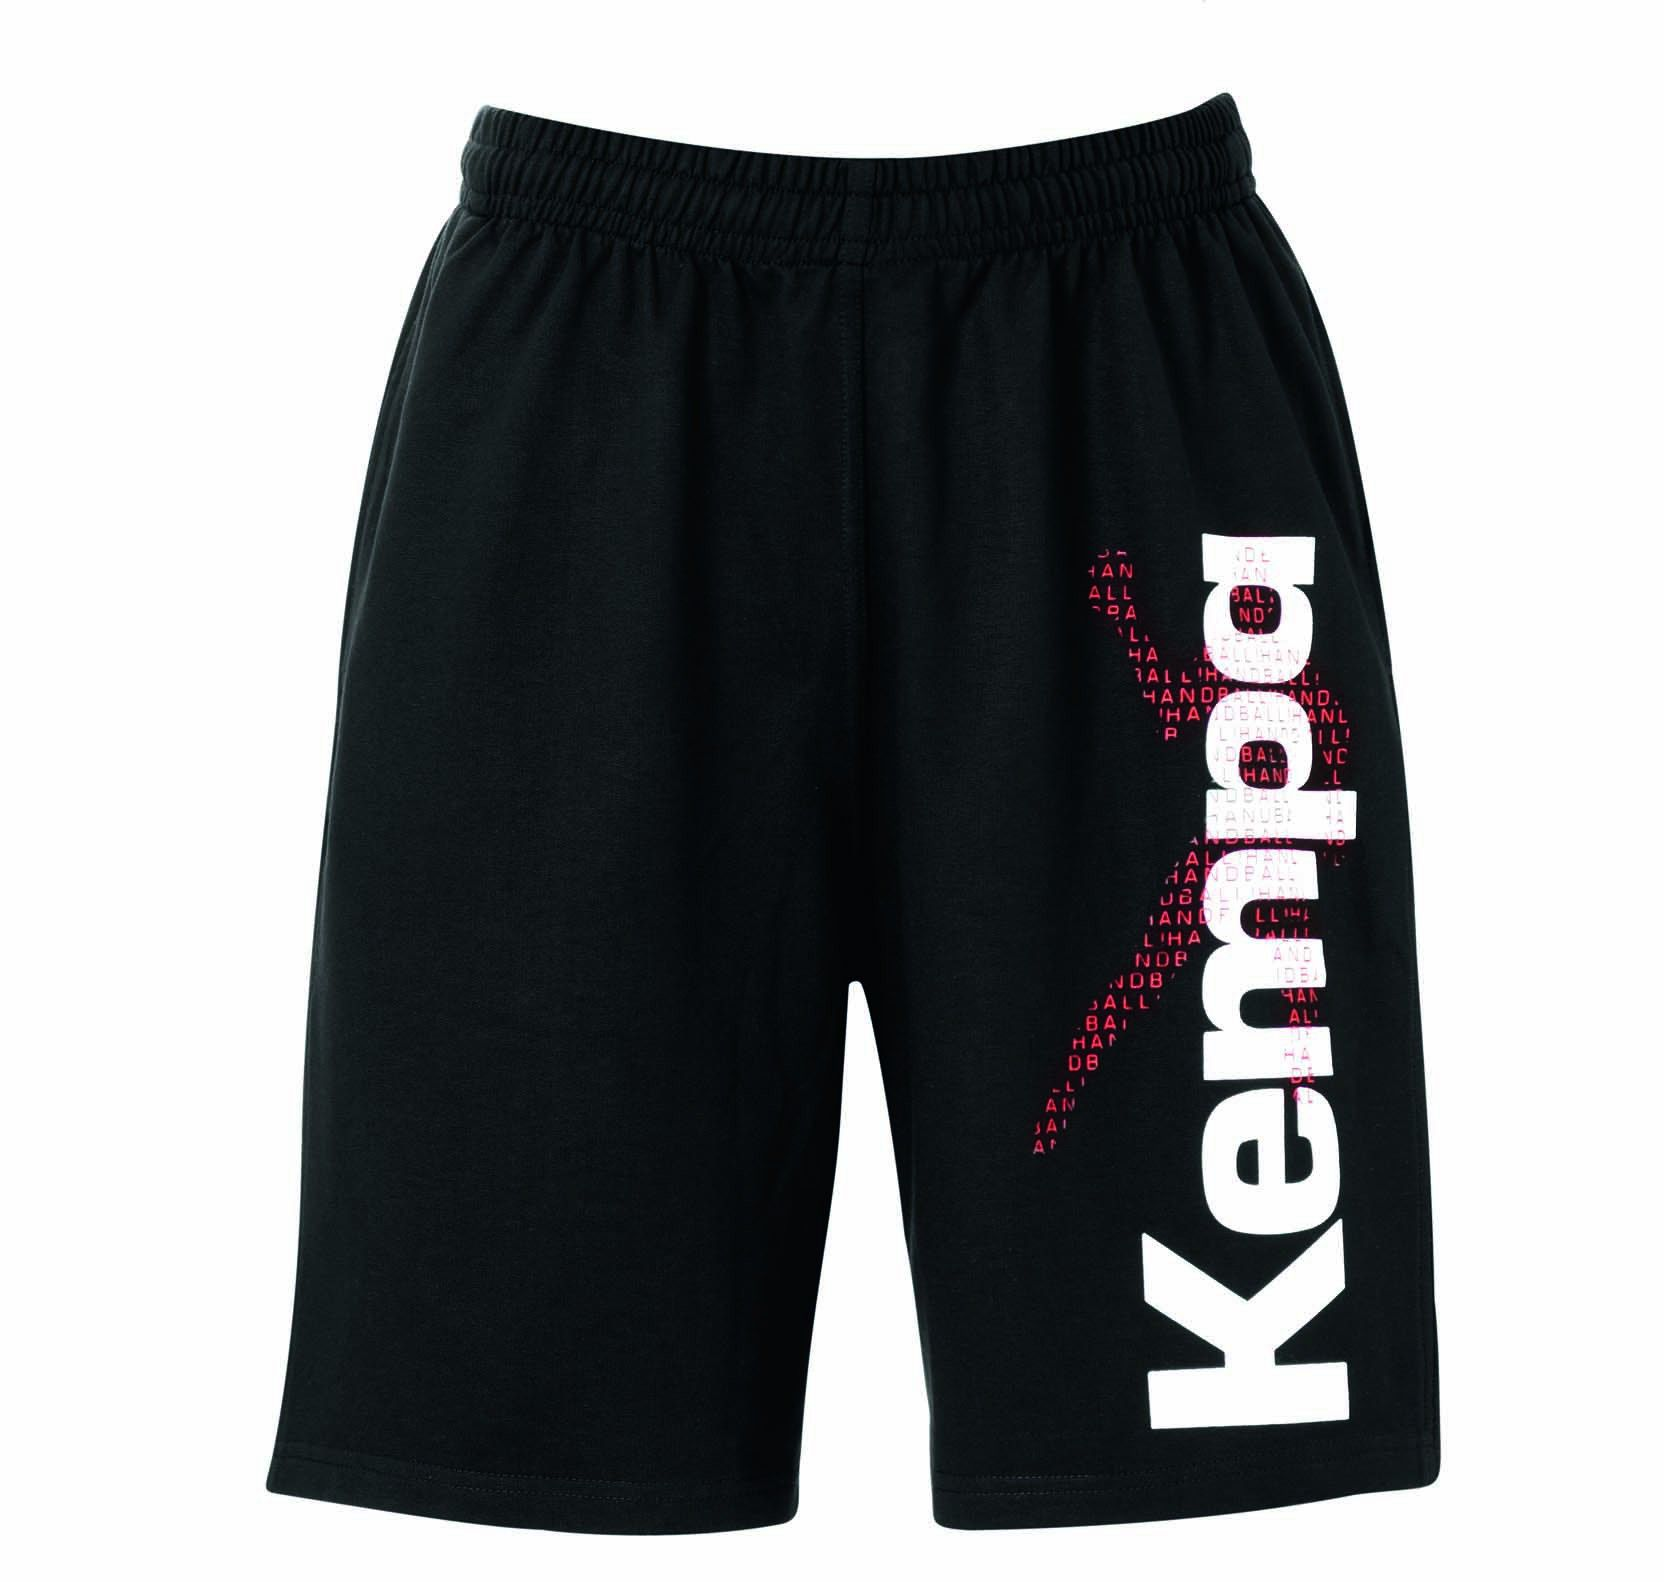 Kempa Protection Pantal/ón Corto Hombre